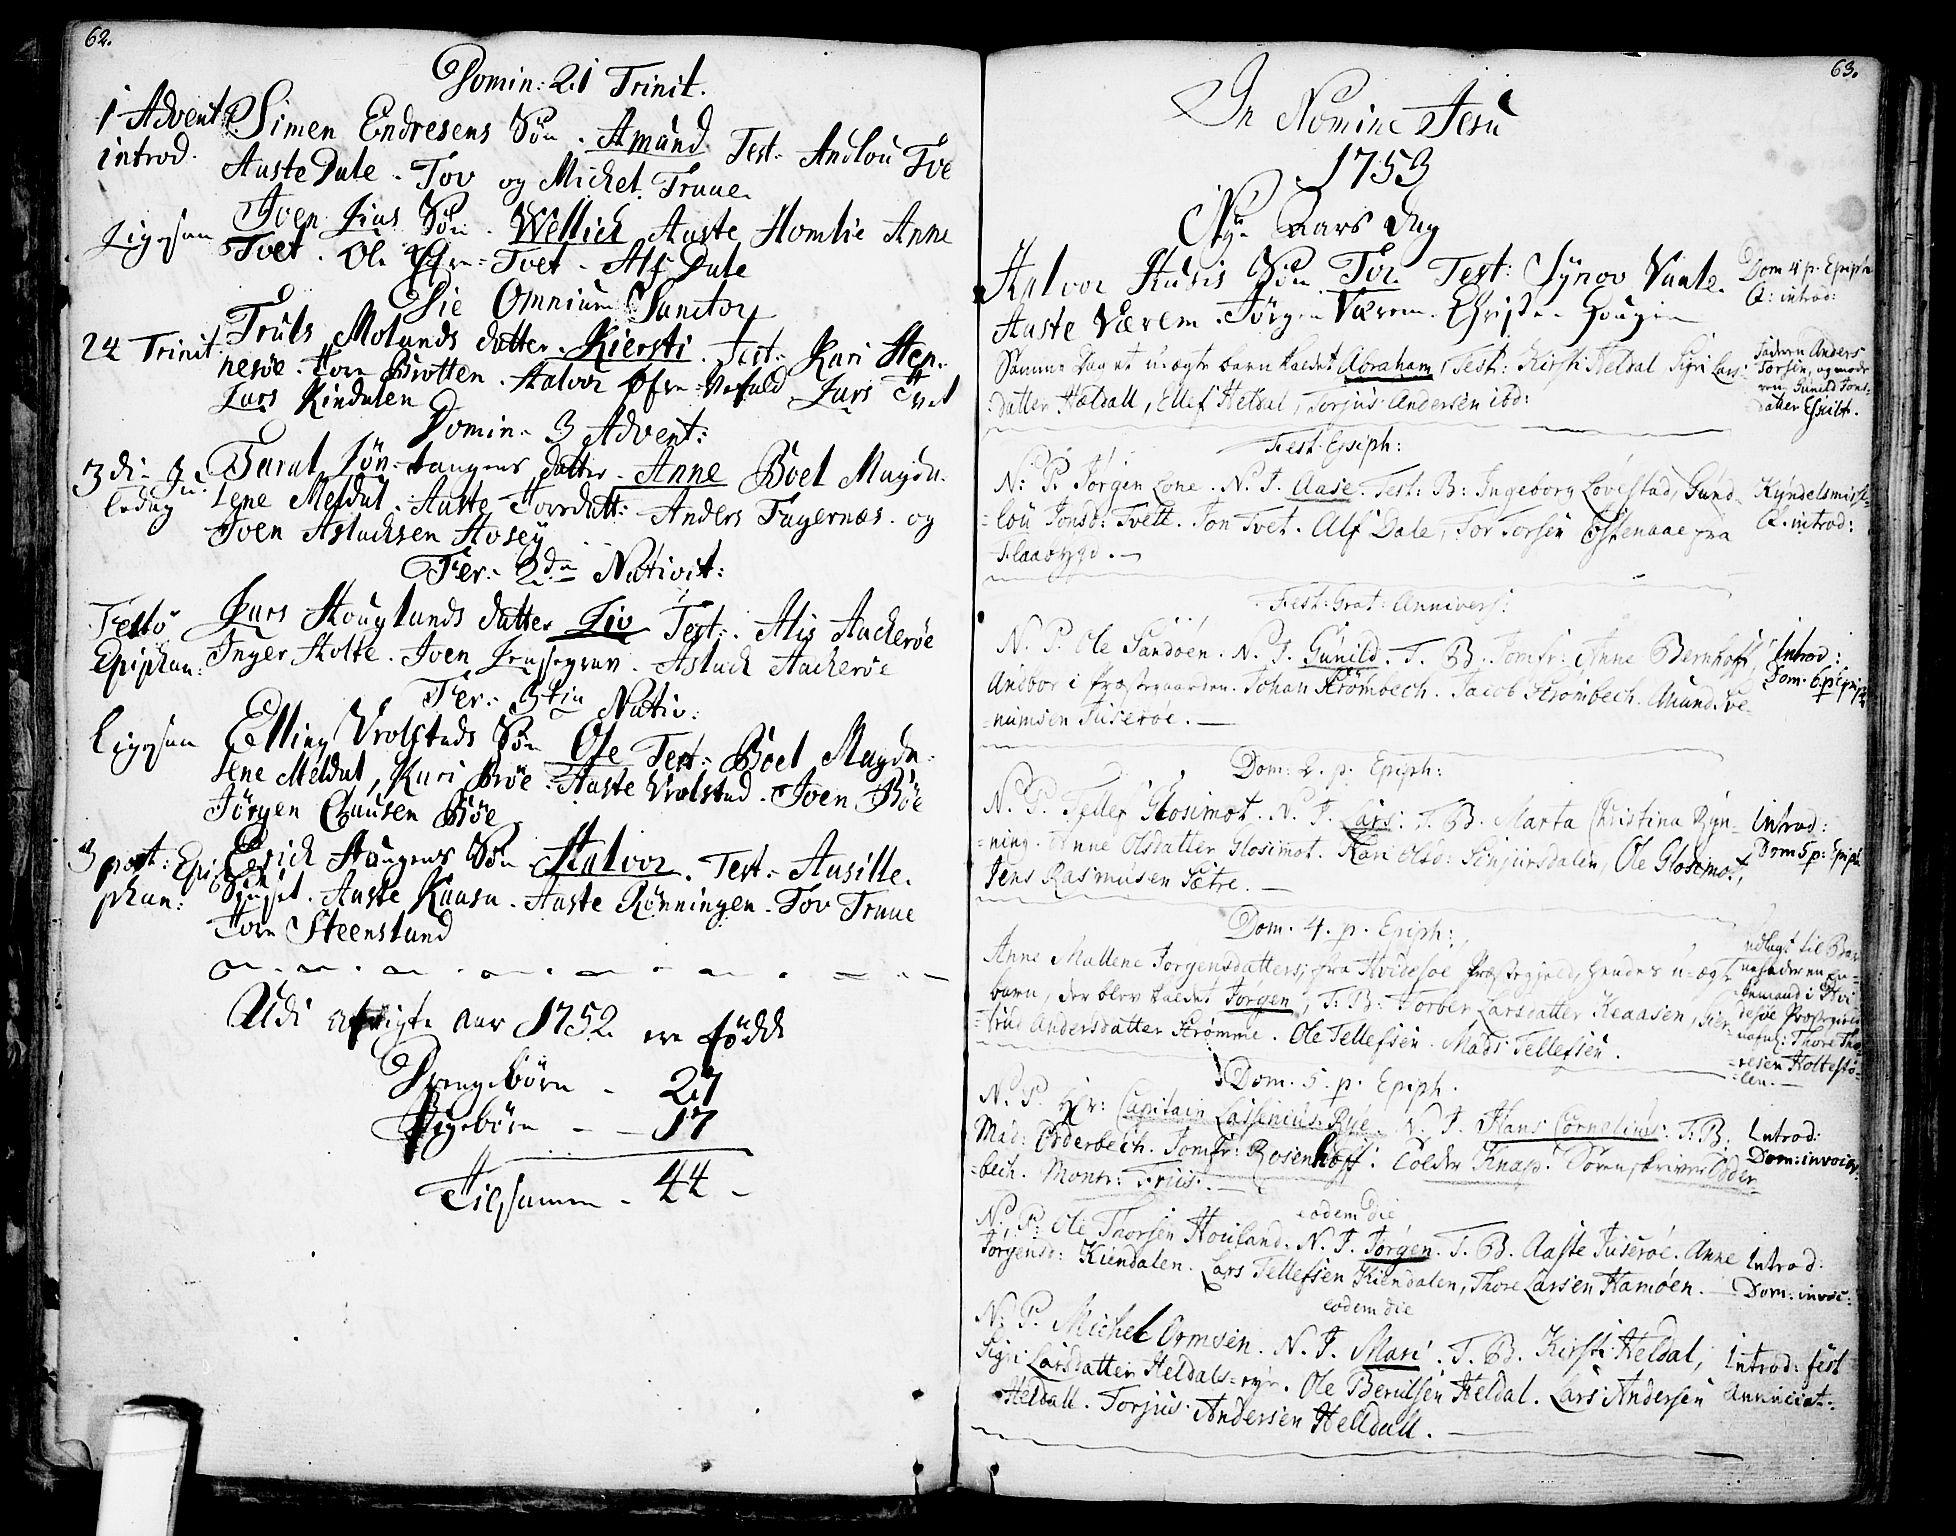 SAKO, Drangedal kirkebøker, F/Fa/L0001: Ministerialbok nr. 1, 1697-1767, s. 62-63